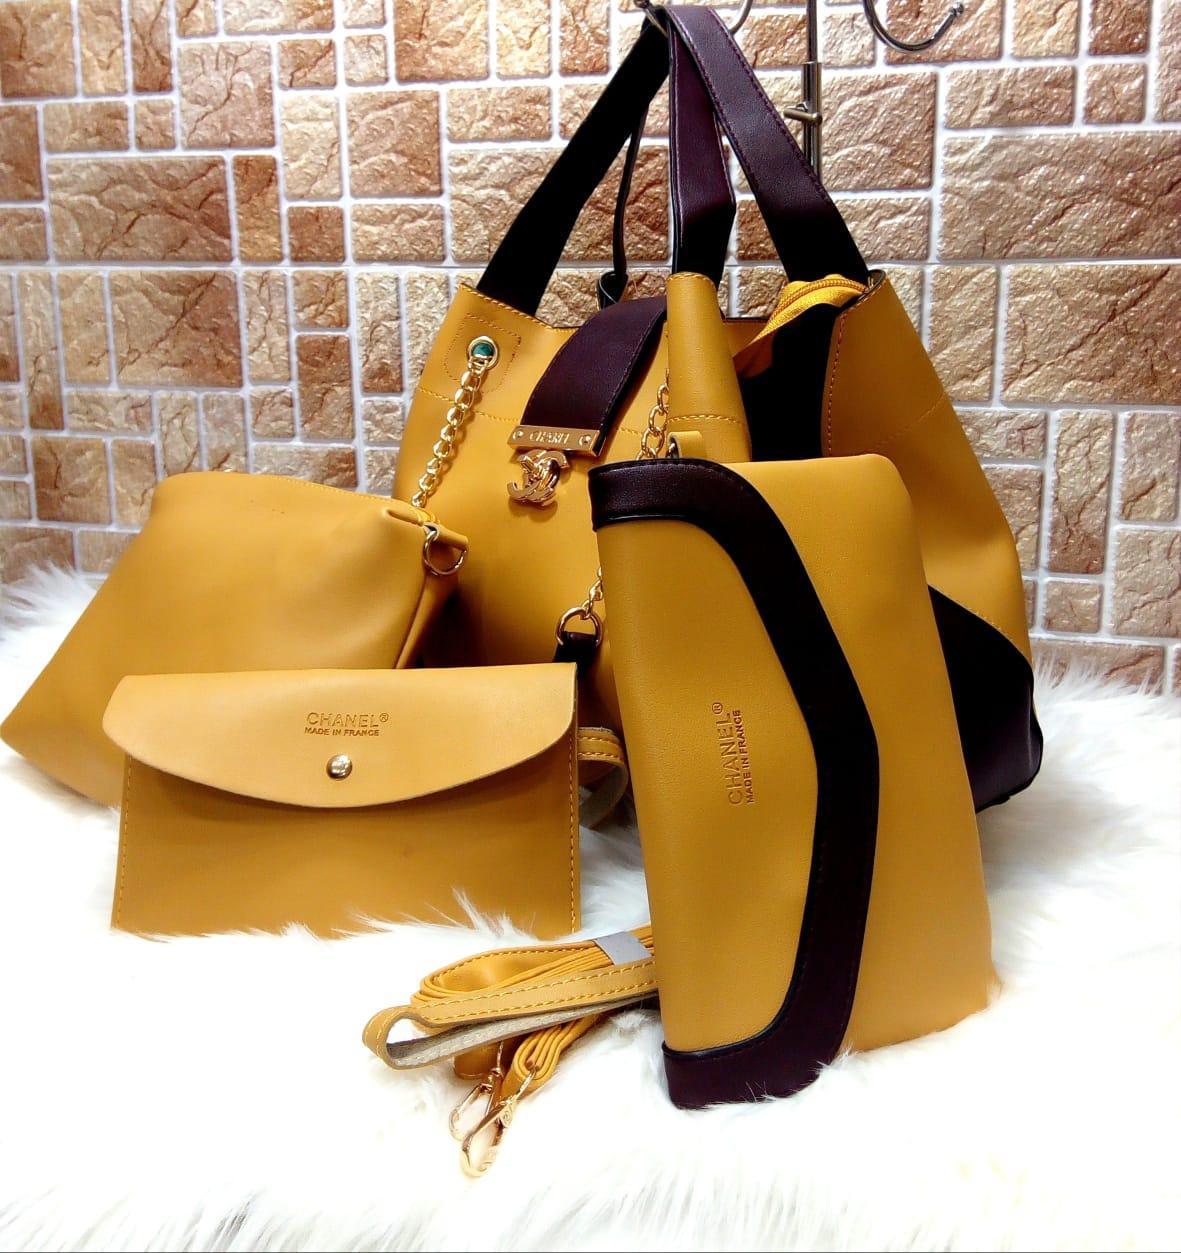 3d4002d23f72 Buy Chanel Women Bags at Best Prices Online in Pakistan - daraz.pk